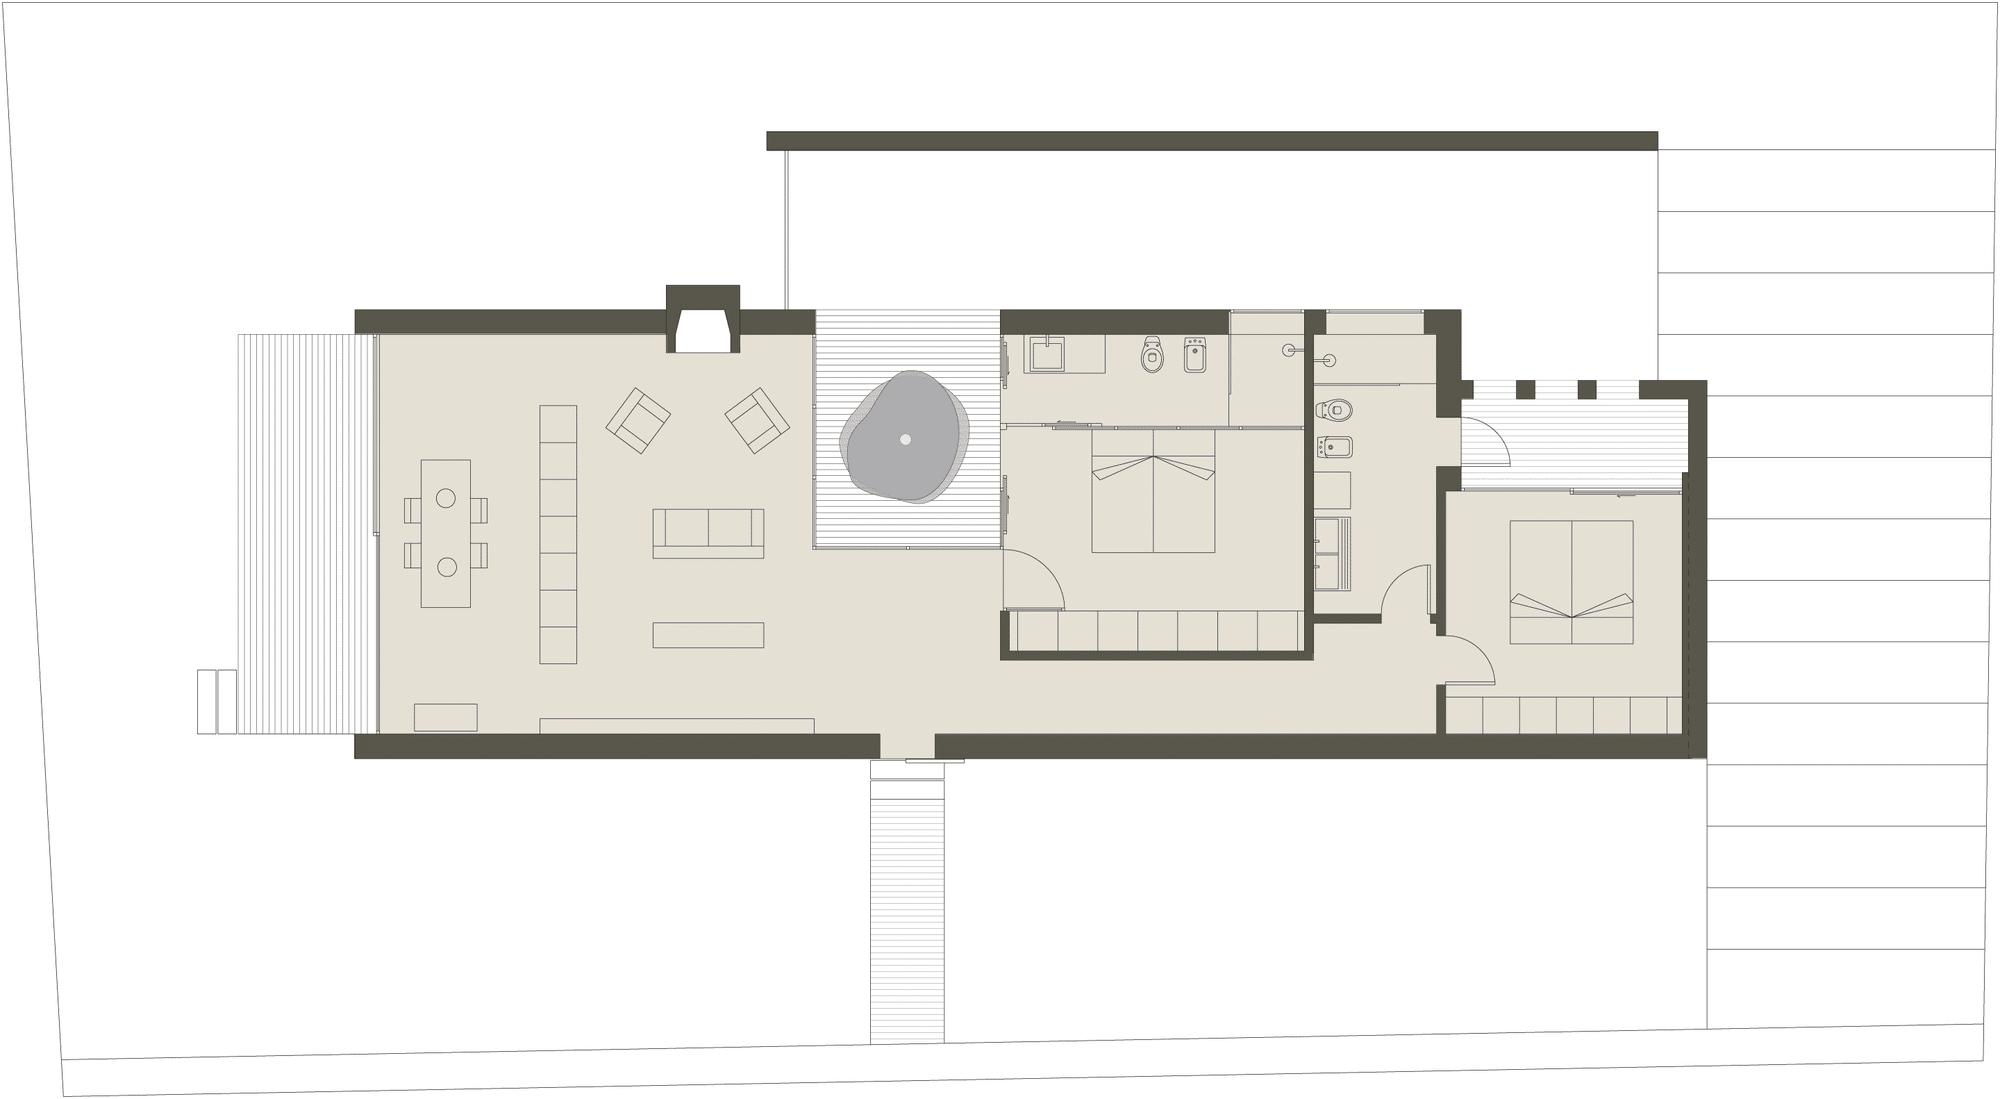 Planos de casa peque a de un piso con cerco perim trico for Techos planos para casas